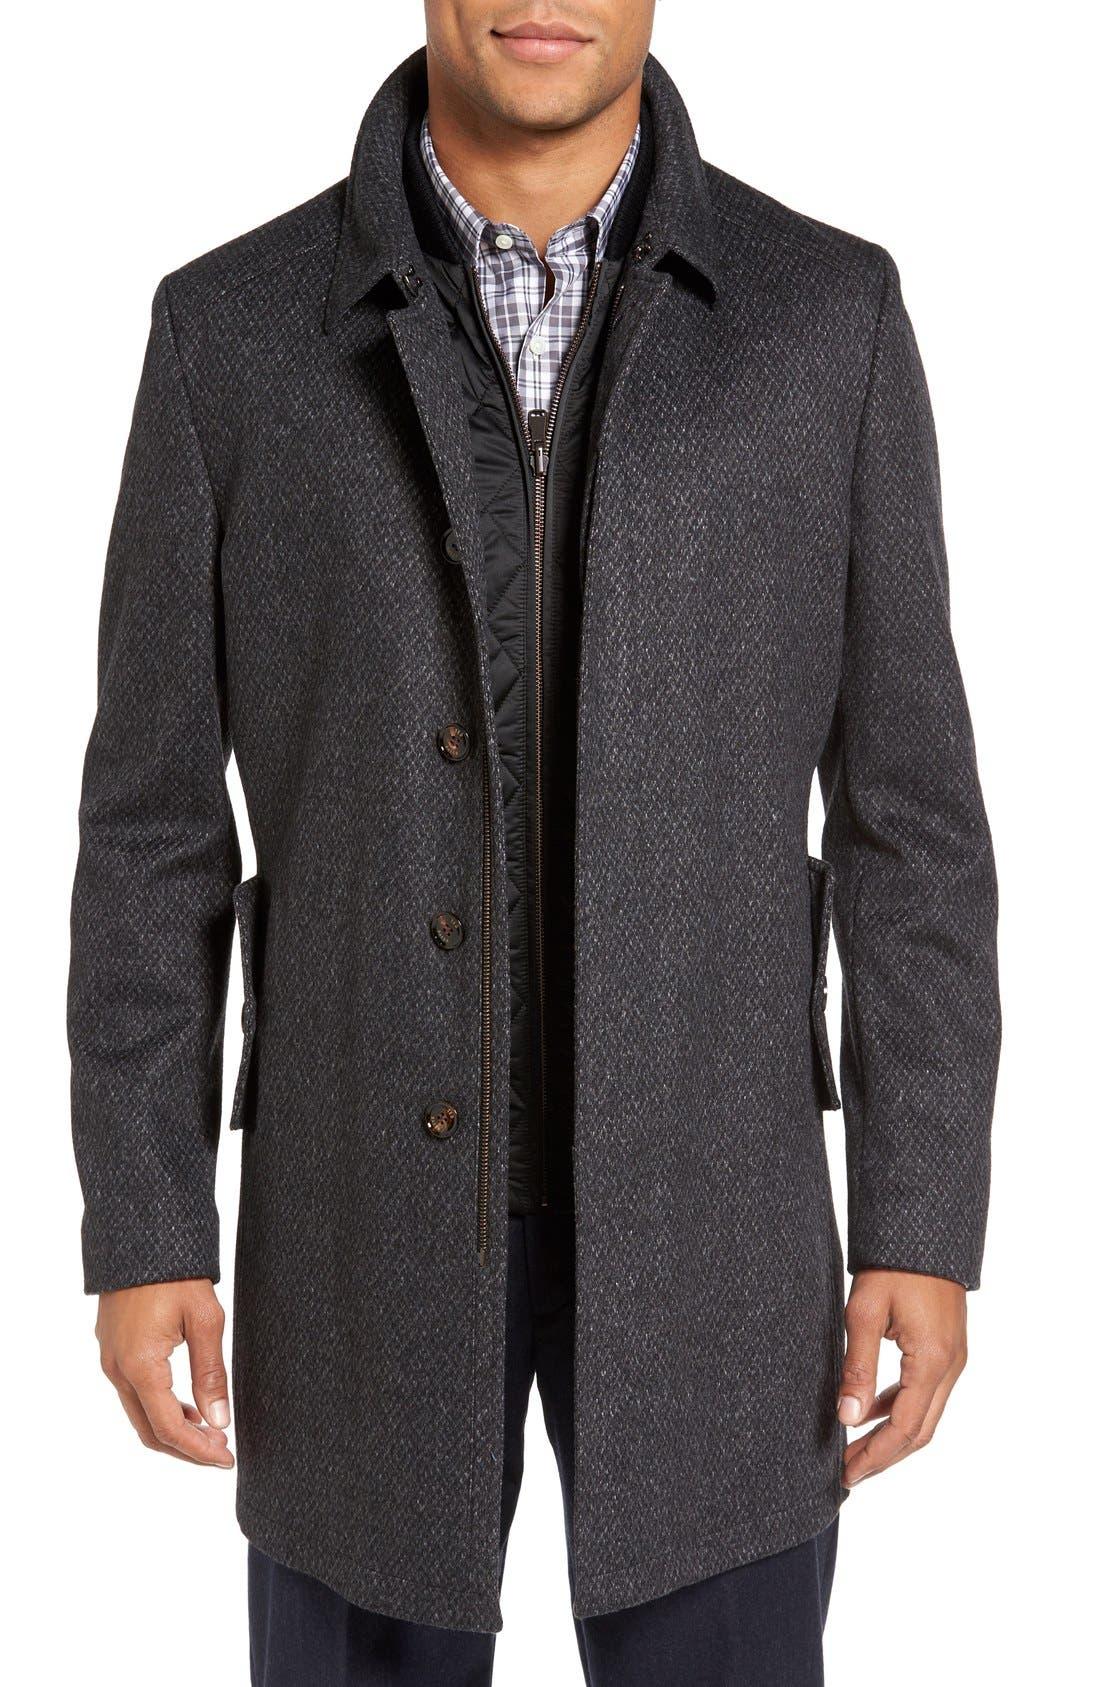 Alternate Image 1 Selected - Ted Baker London Arizona Wool Blend Overcoat